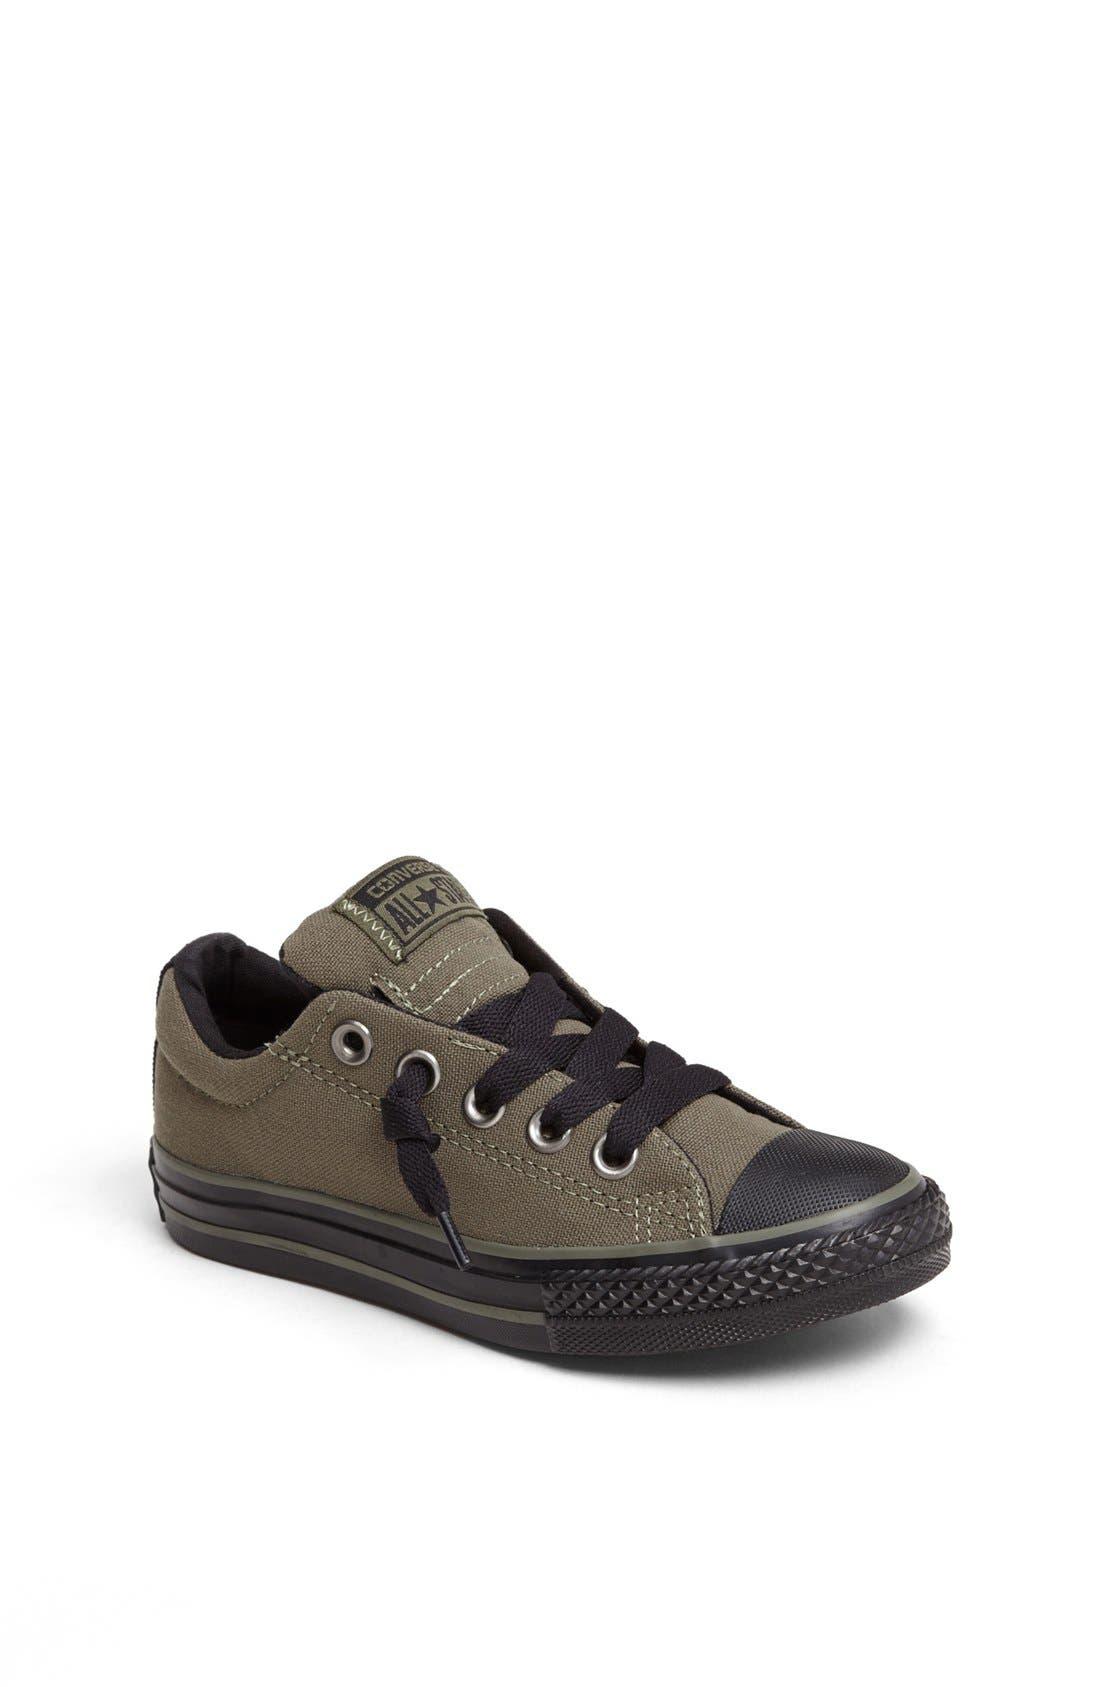 Alternate Image 1 Selected - Converse Chuck Taylor® 'CT Street' Slip-On Sneaker (Toddler, Little Kid & Big Kid)